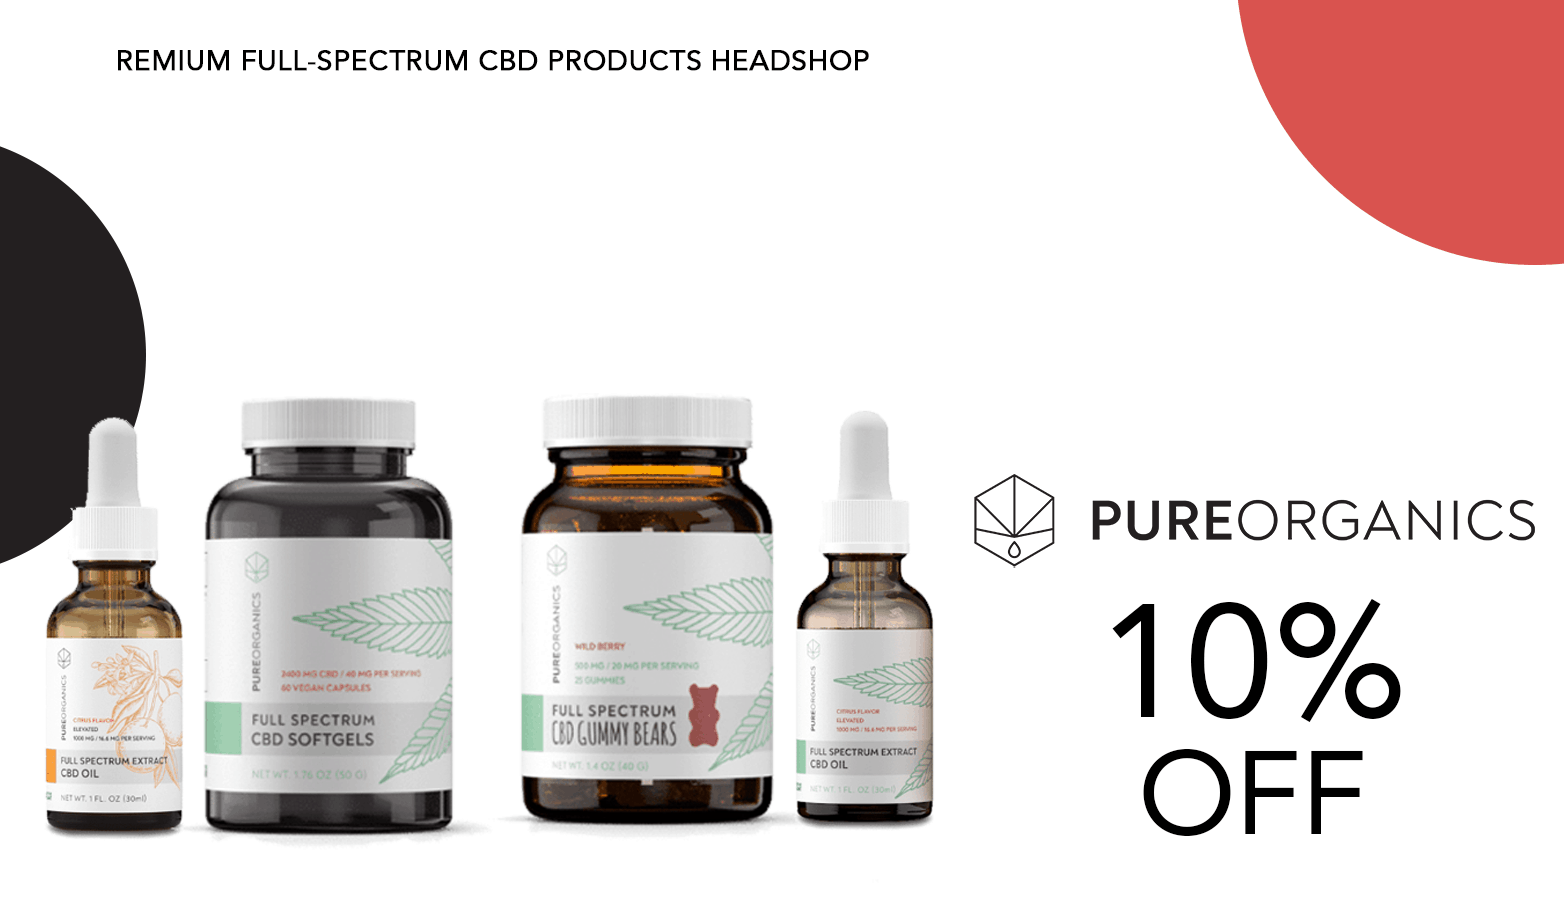 Pure Organics CBD Coupon Code Offer Website